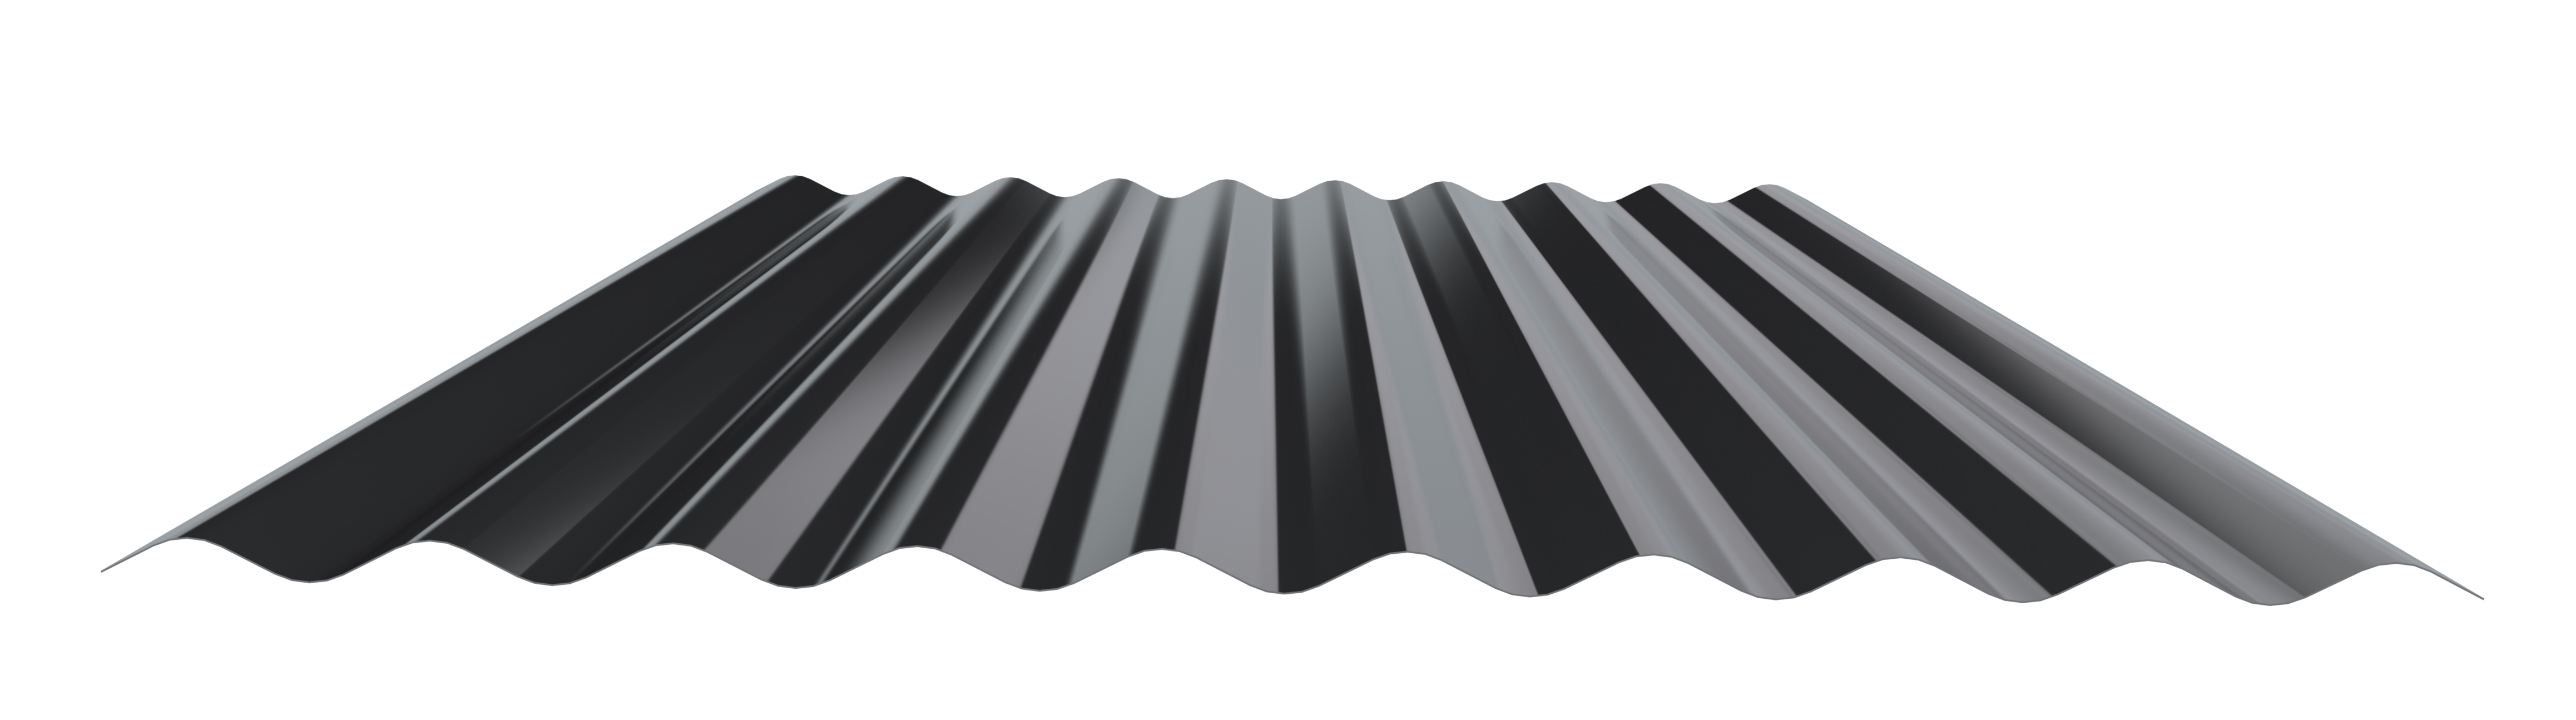 Corrugated Metal Siding Amp Wall Panel 1 2 Corrugated